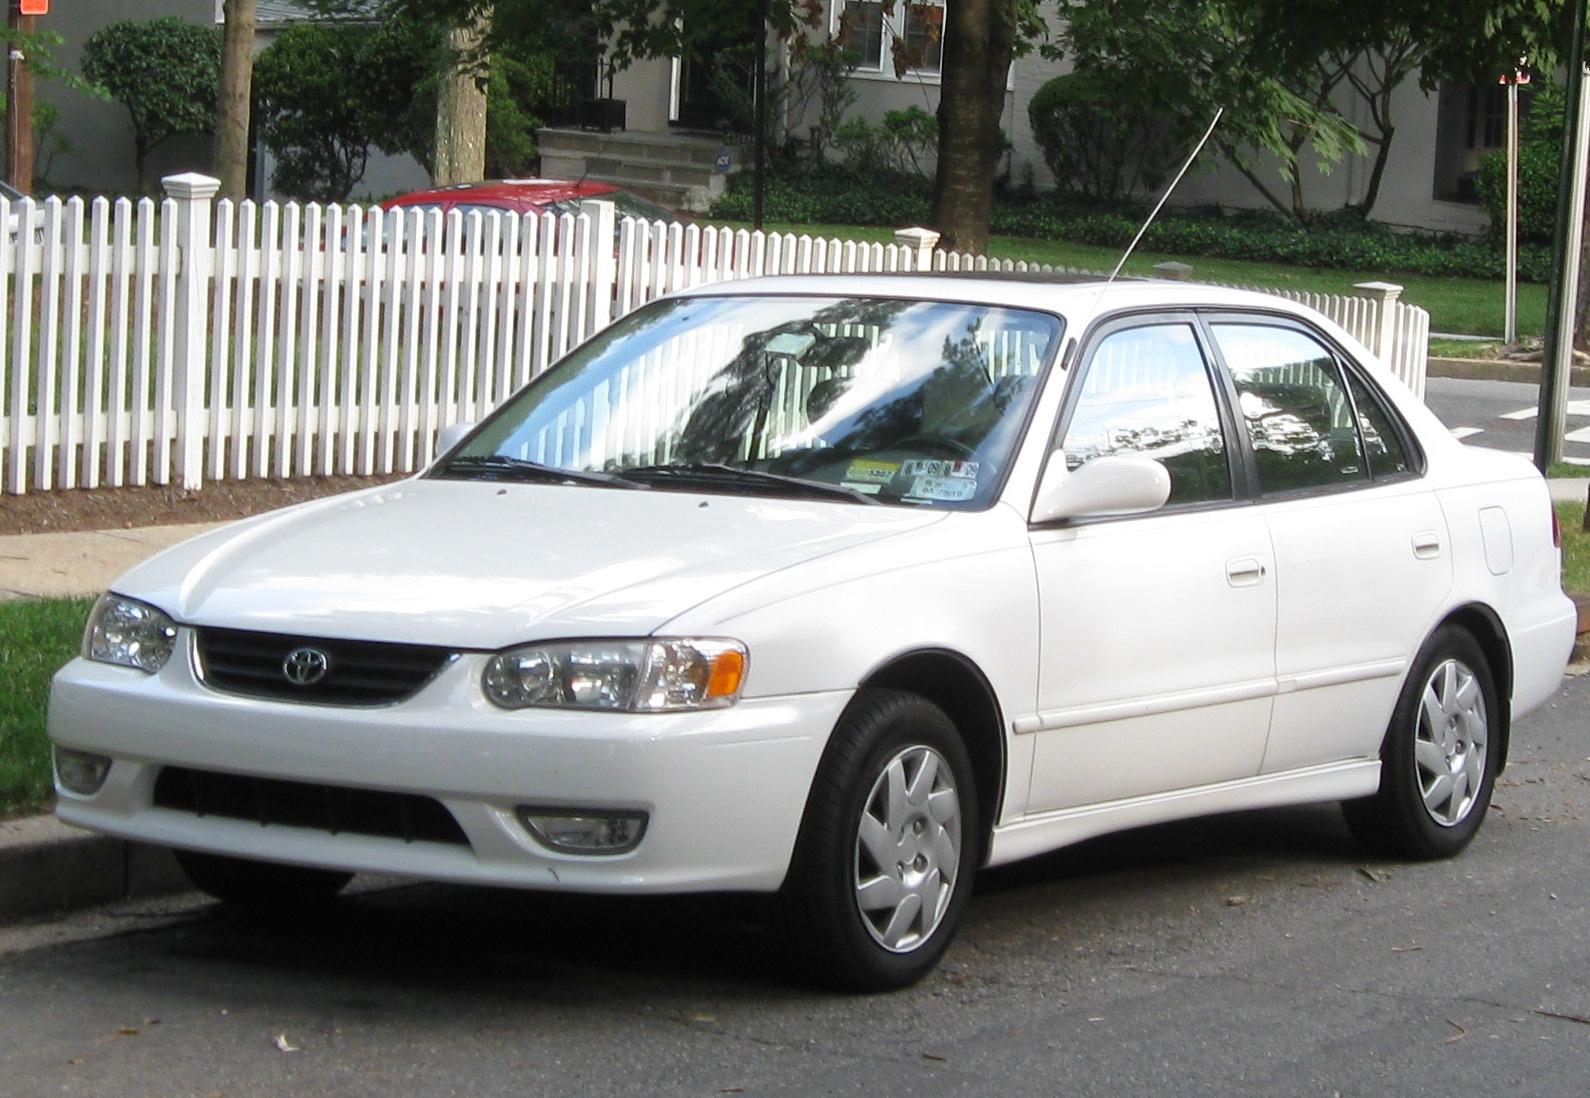 Замена передней противотуманной фары Toyota Corolla E11, видео Ремонт TOYOTA COROLLA / ТОЙОТА Королла.